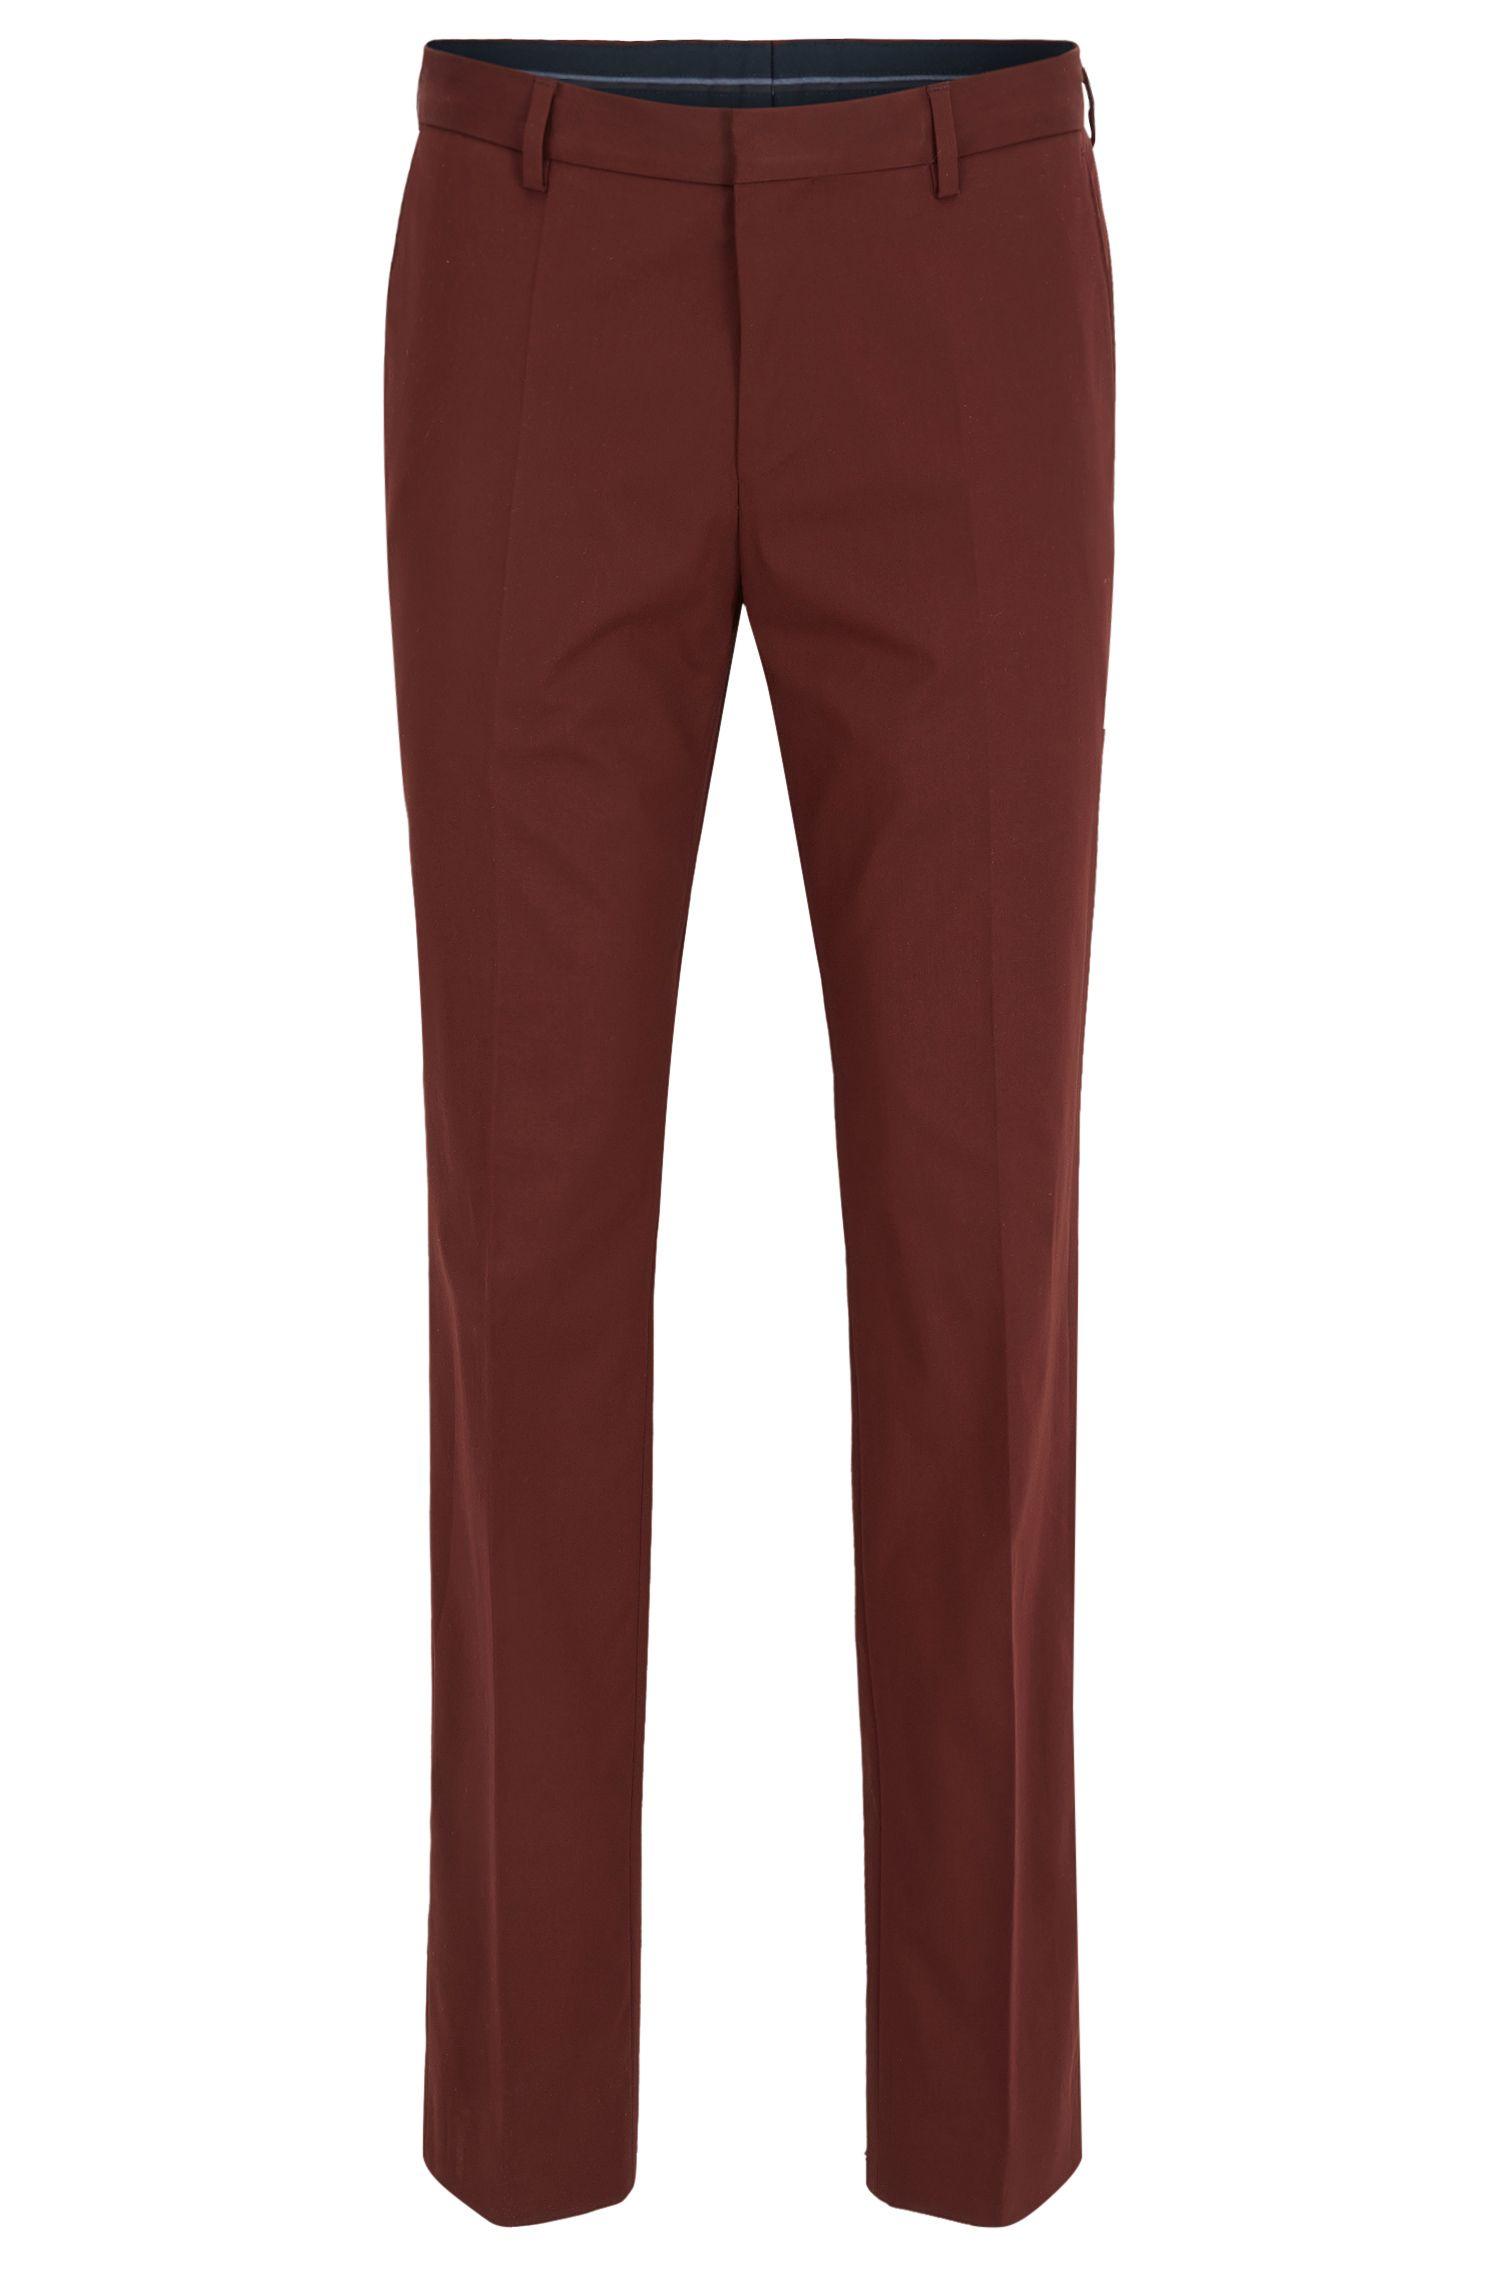 Stretch Cotton Dress Pants, Slim Git | Genesis